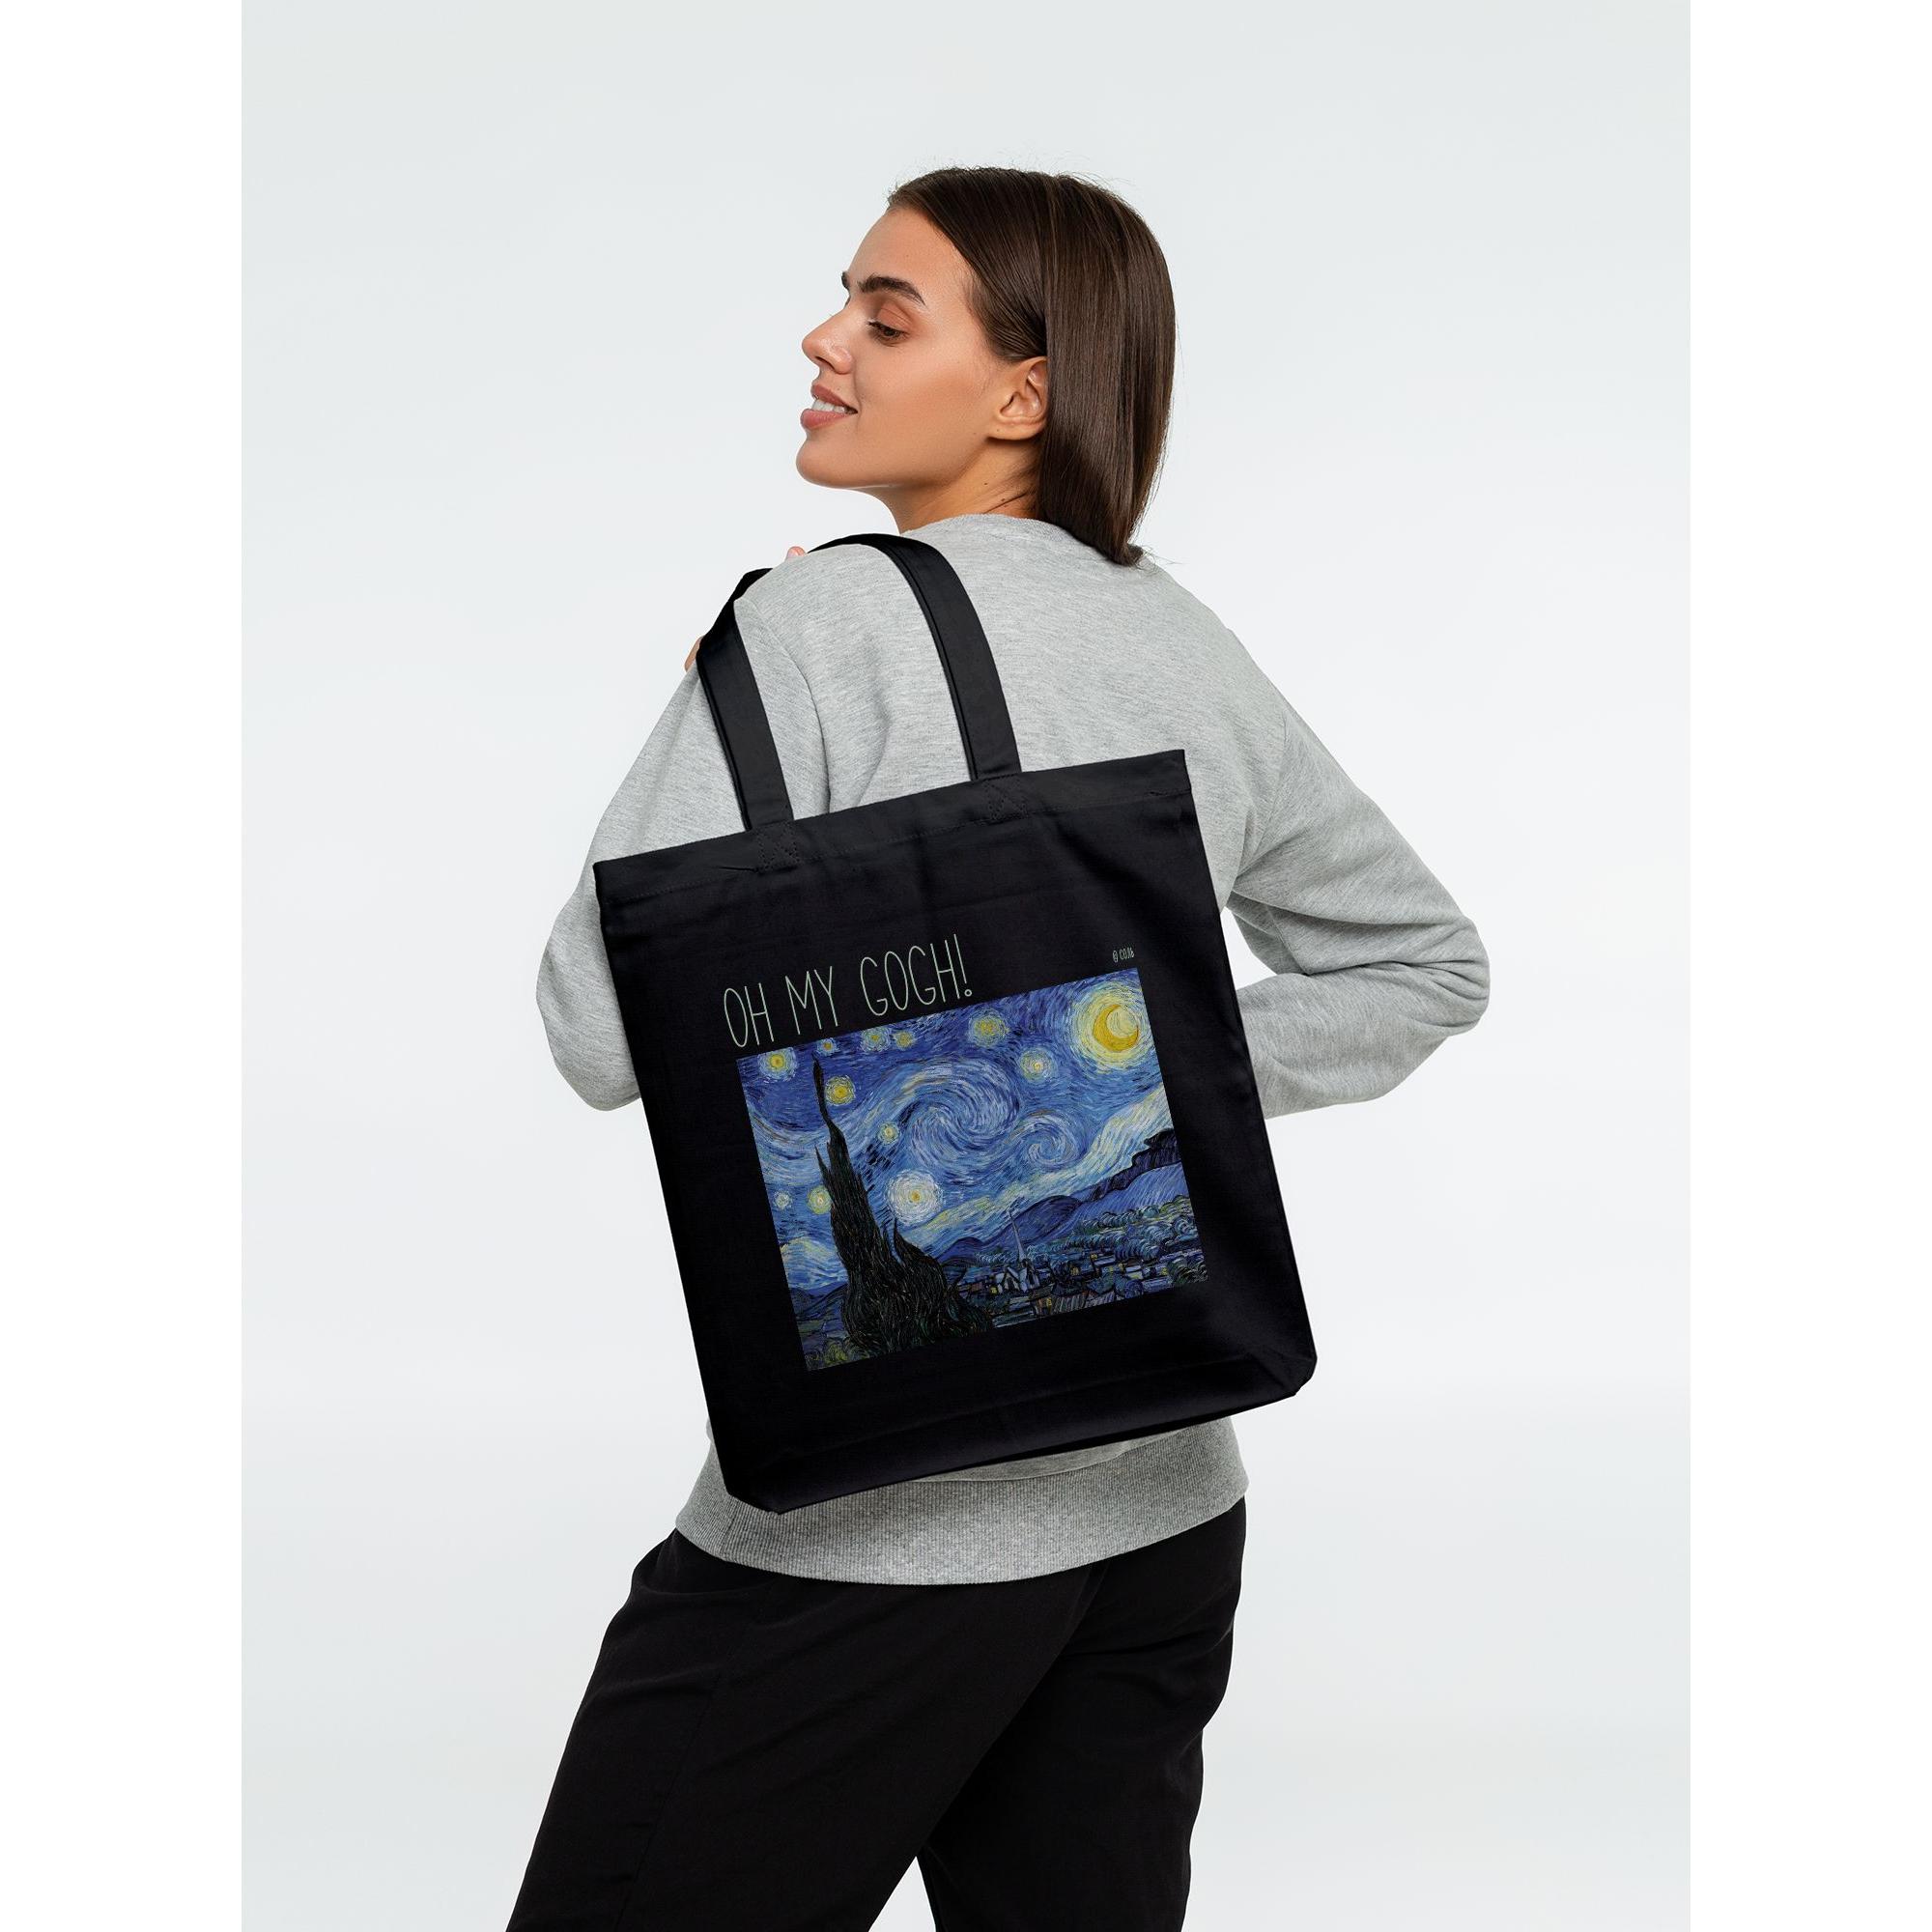 Холщовая сумка «Oh my Gogh!», черная фото 0